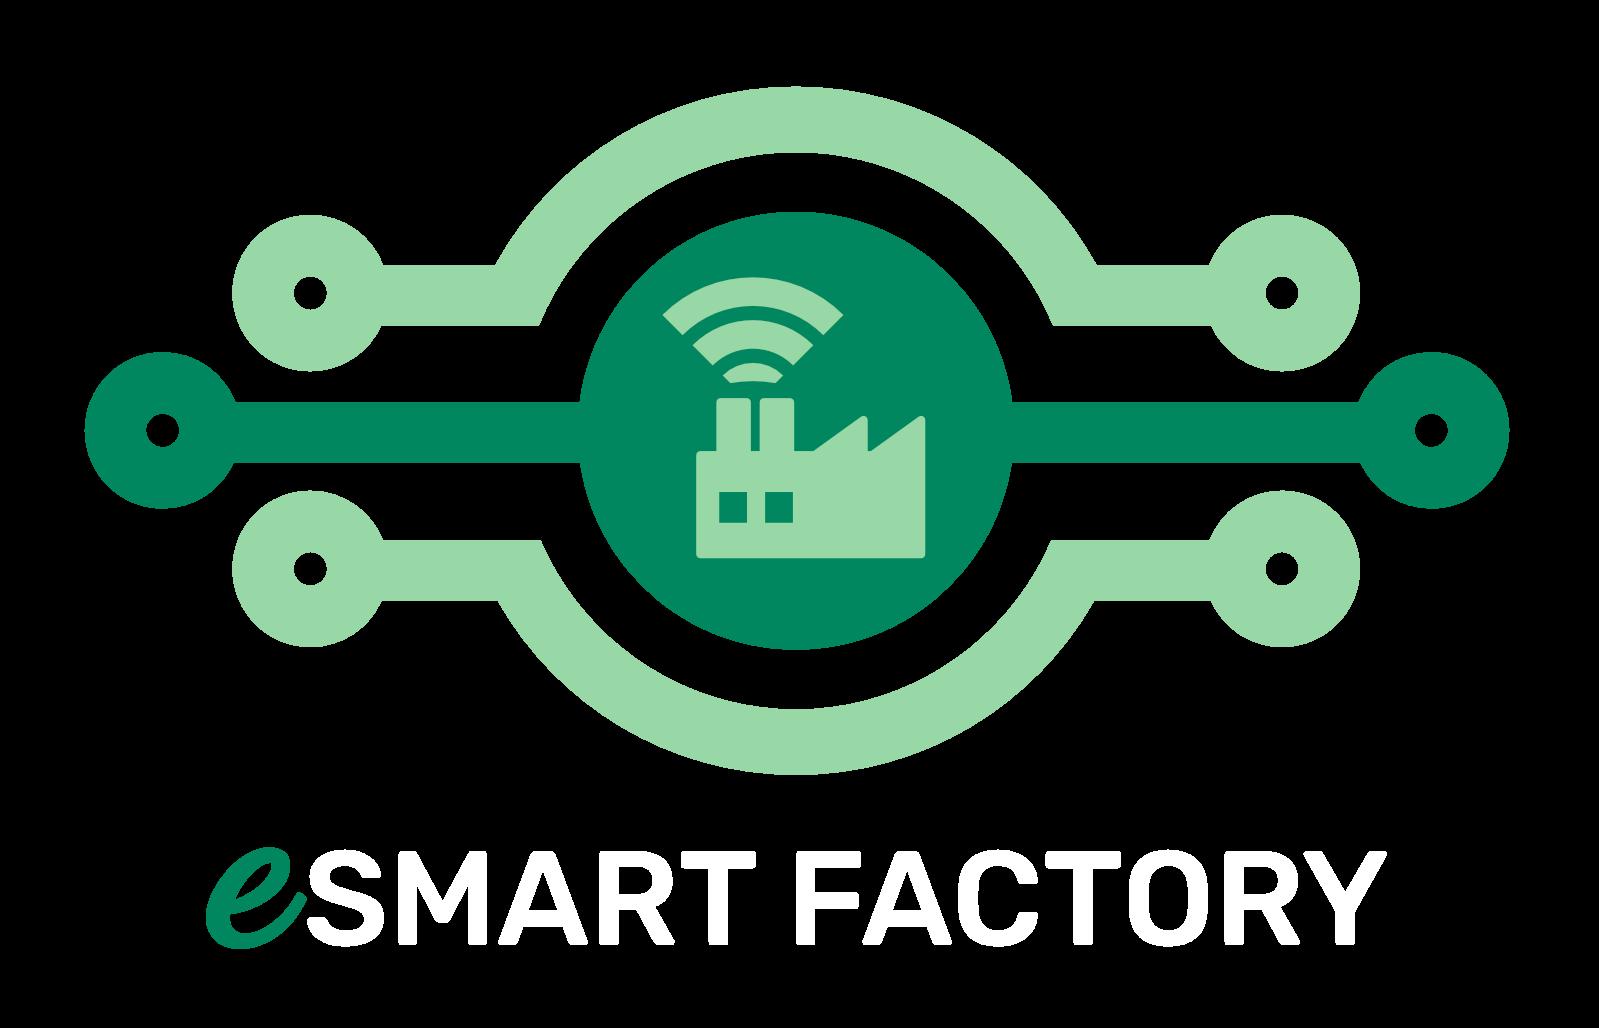 eSmart Factory logo